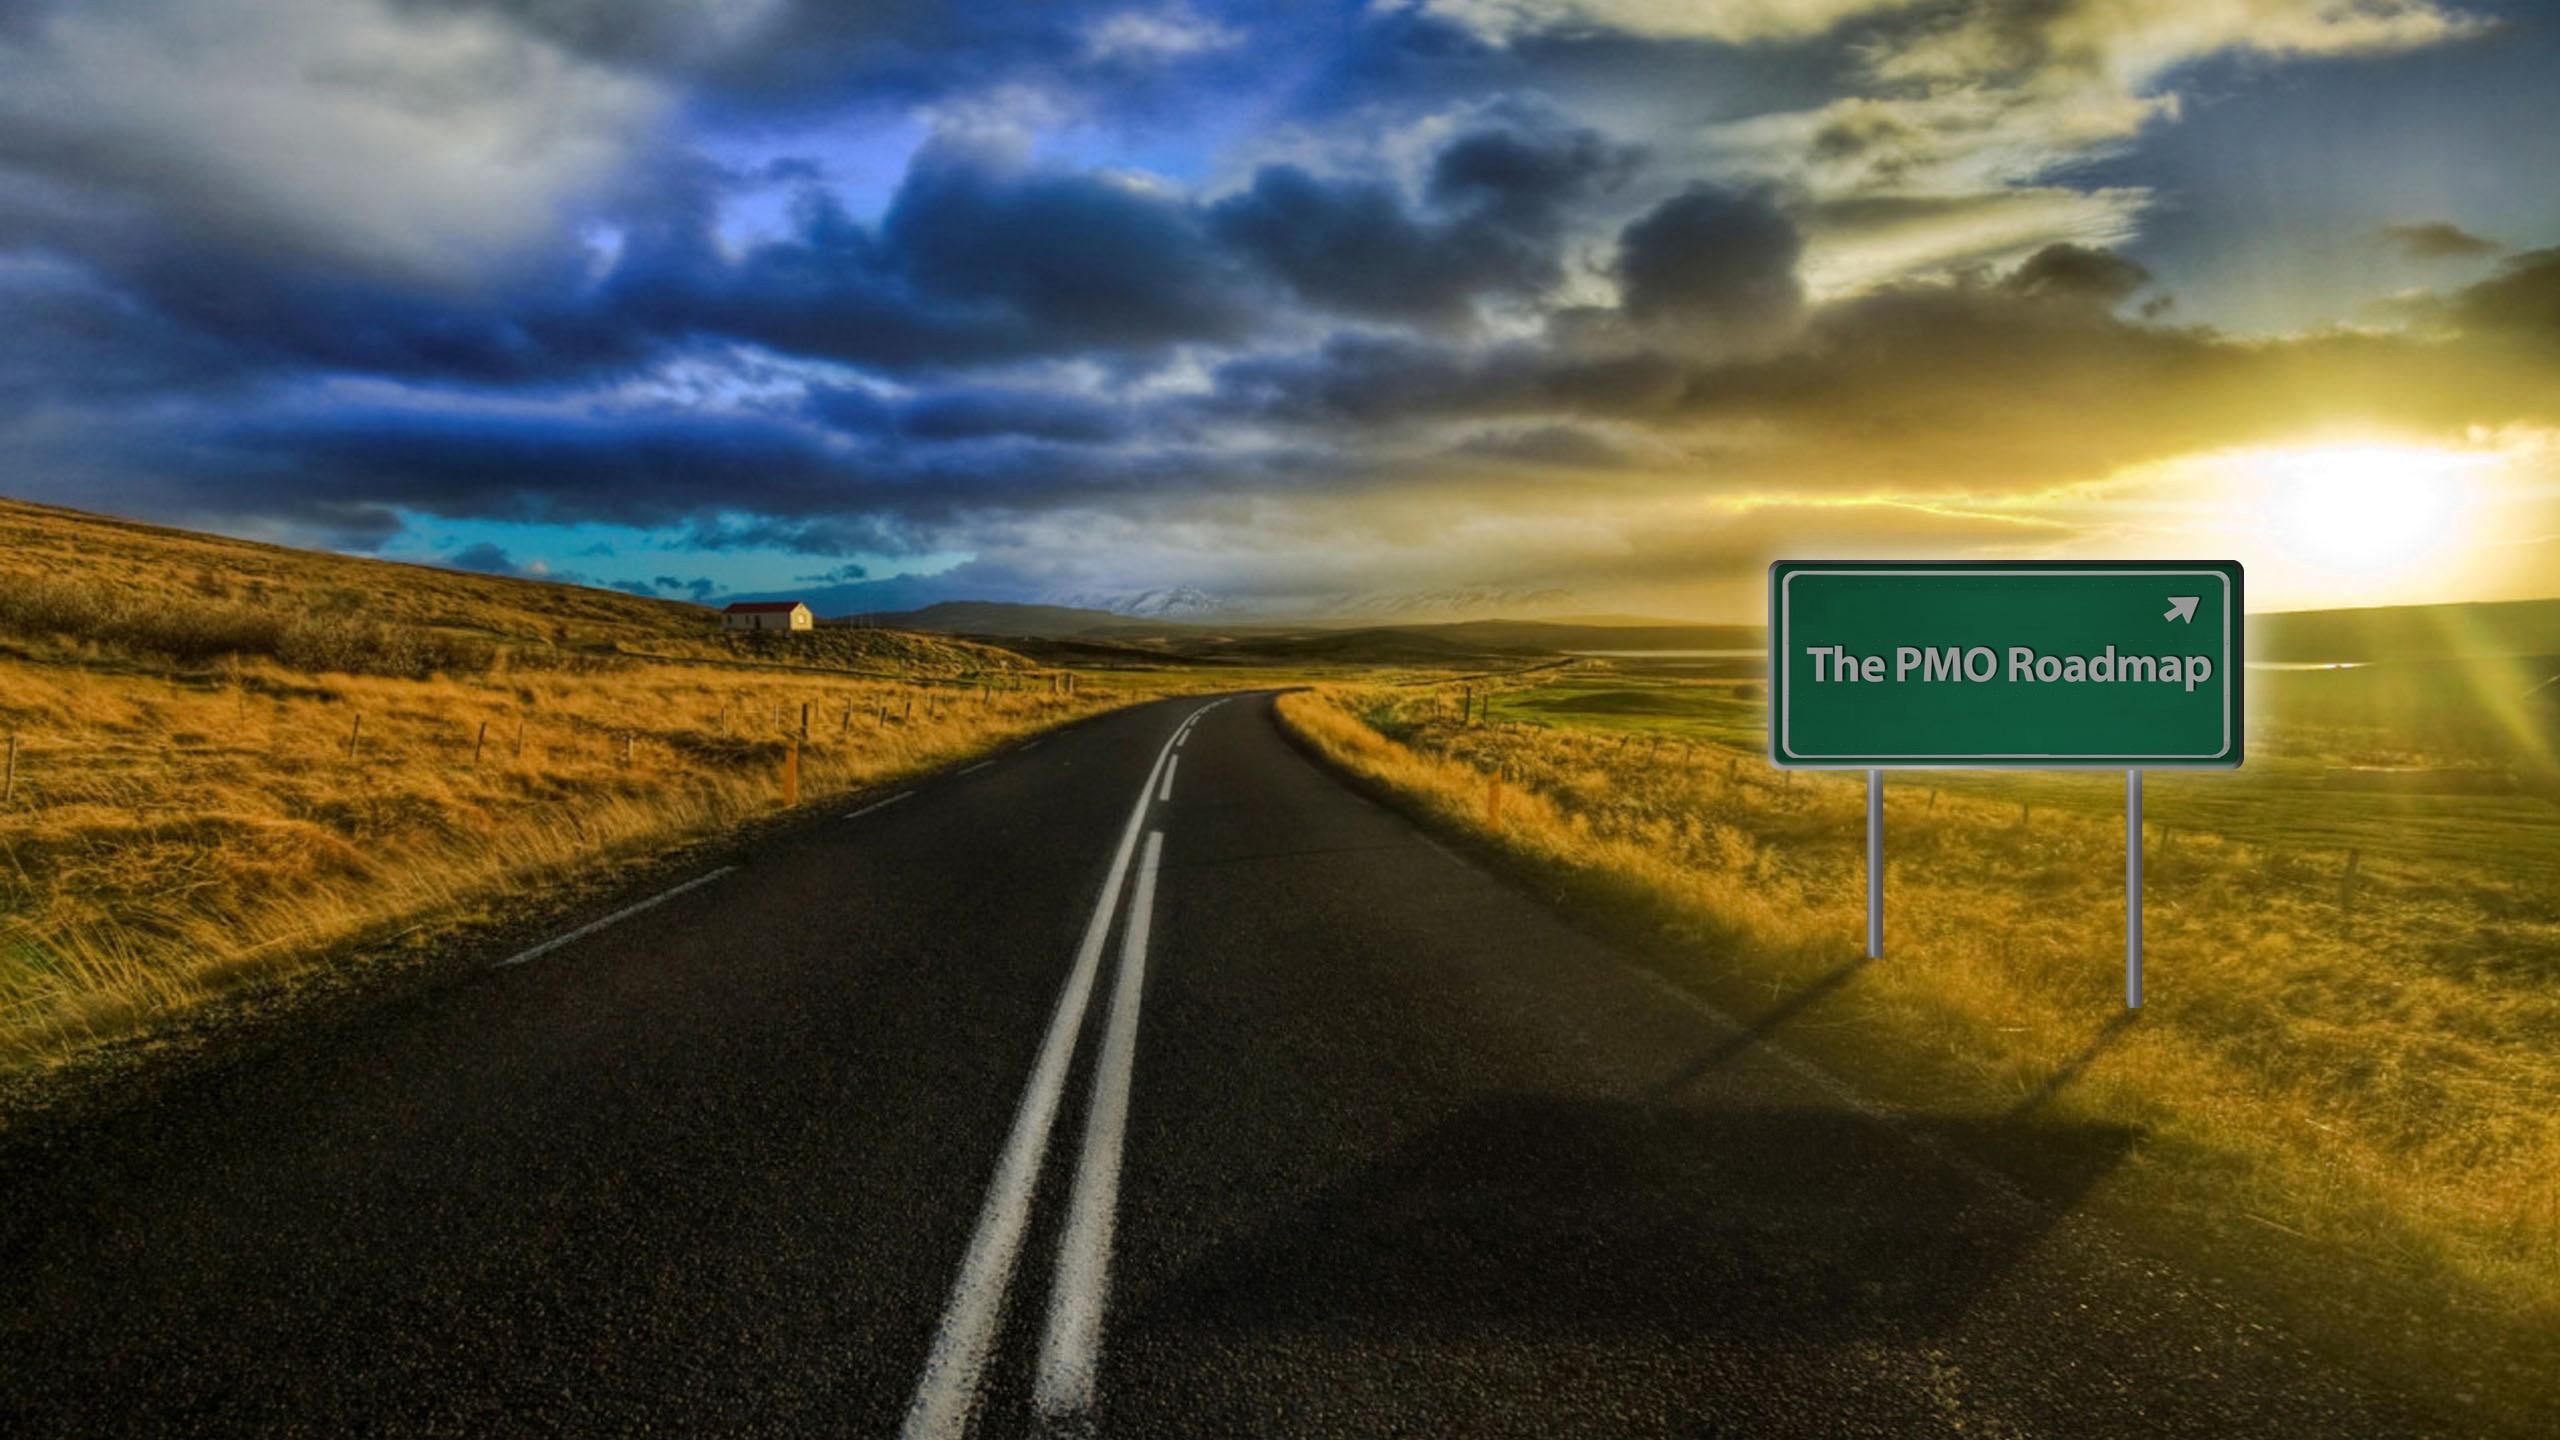 thepmoroadmap sign